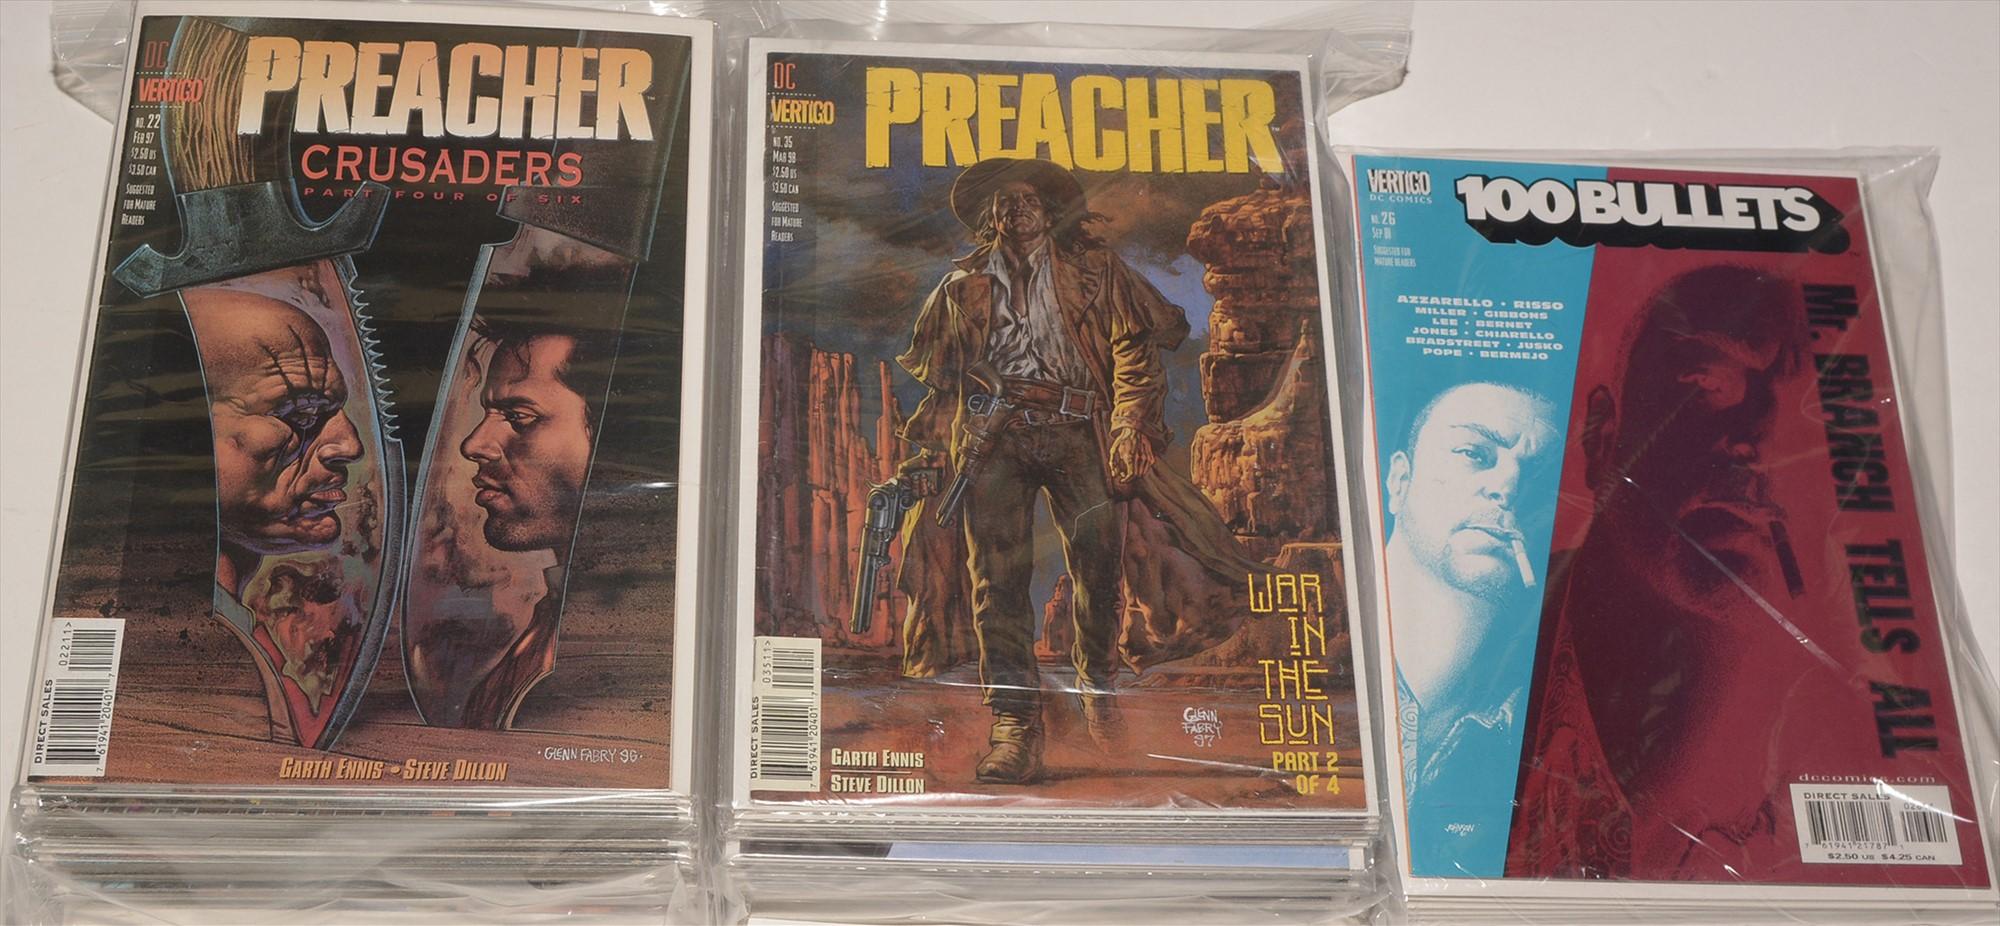 The Preacher by DC Vertigo; and 100 Bullets, sundry issues